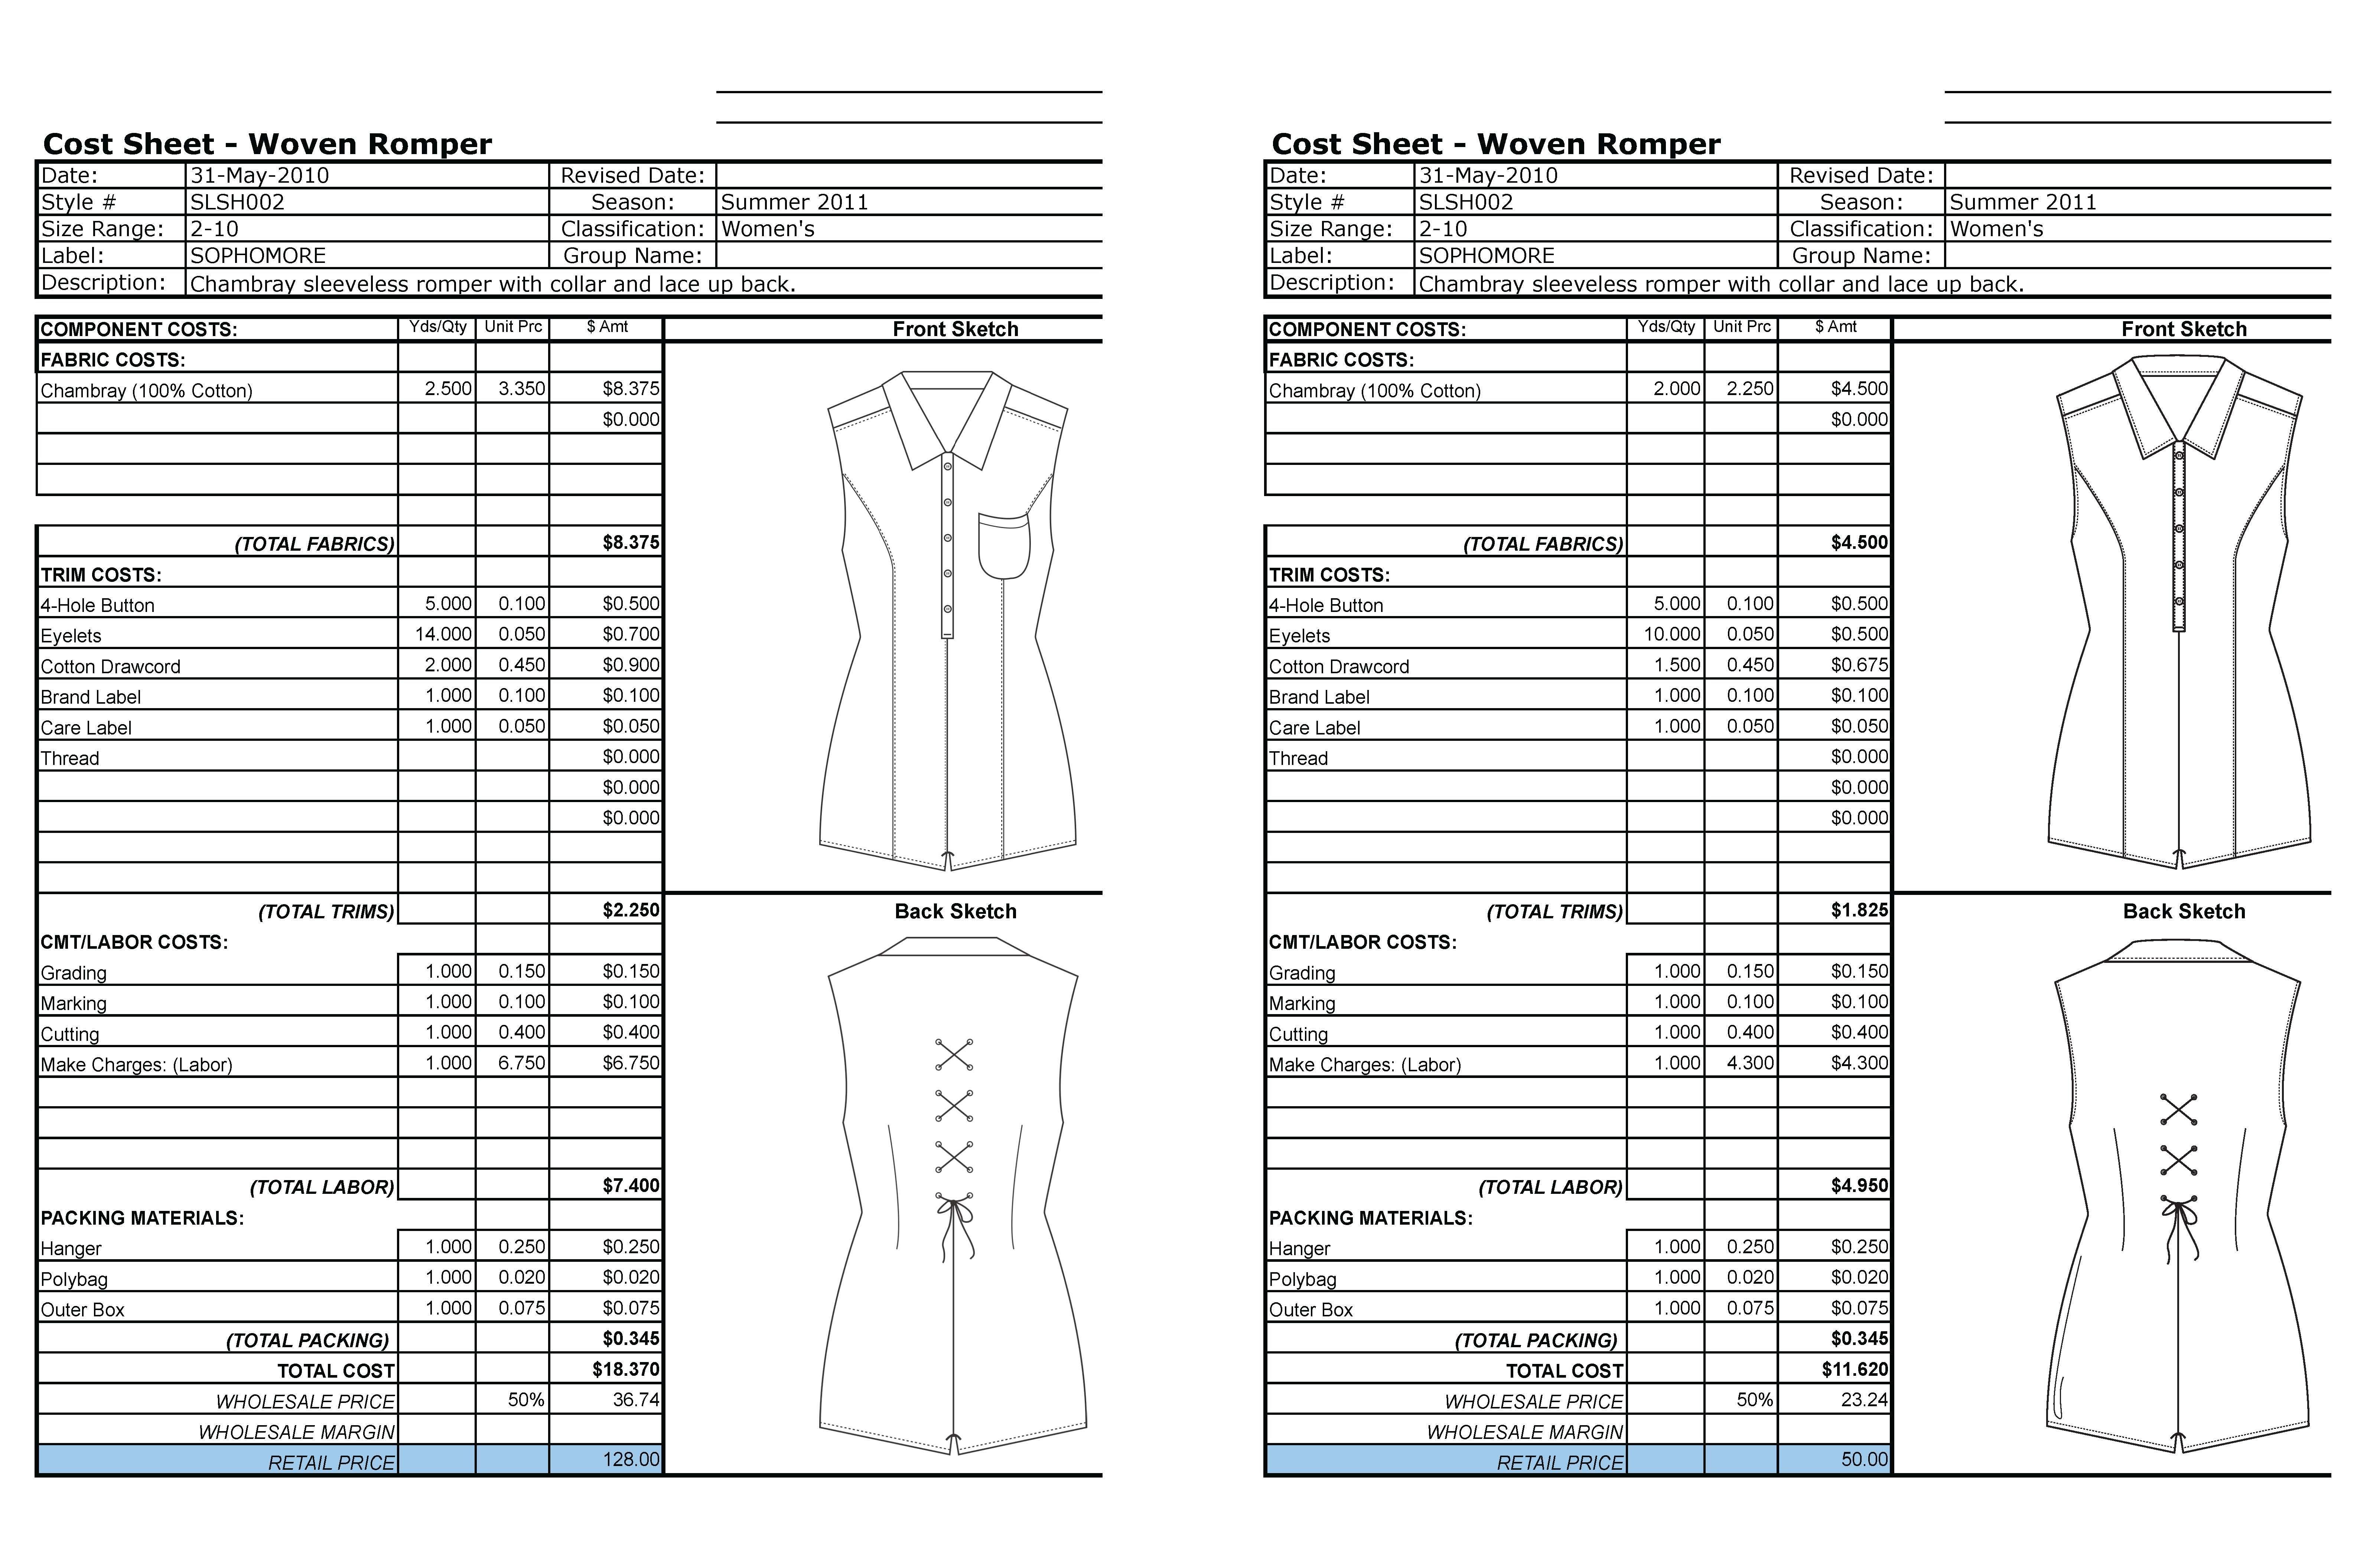 Garment Costing Sheet  Google Search  Entrepreneur